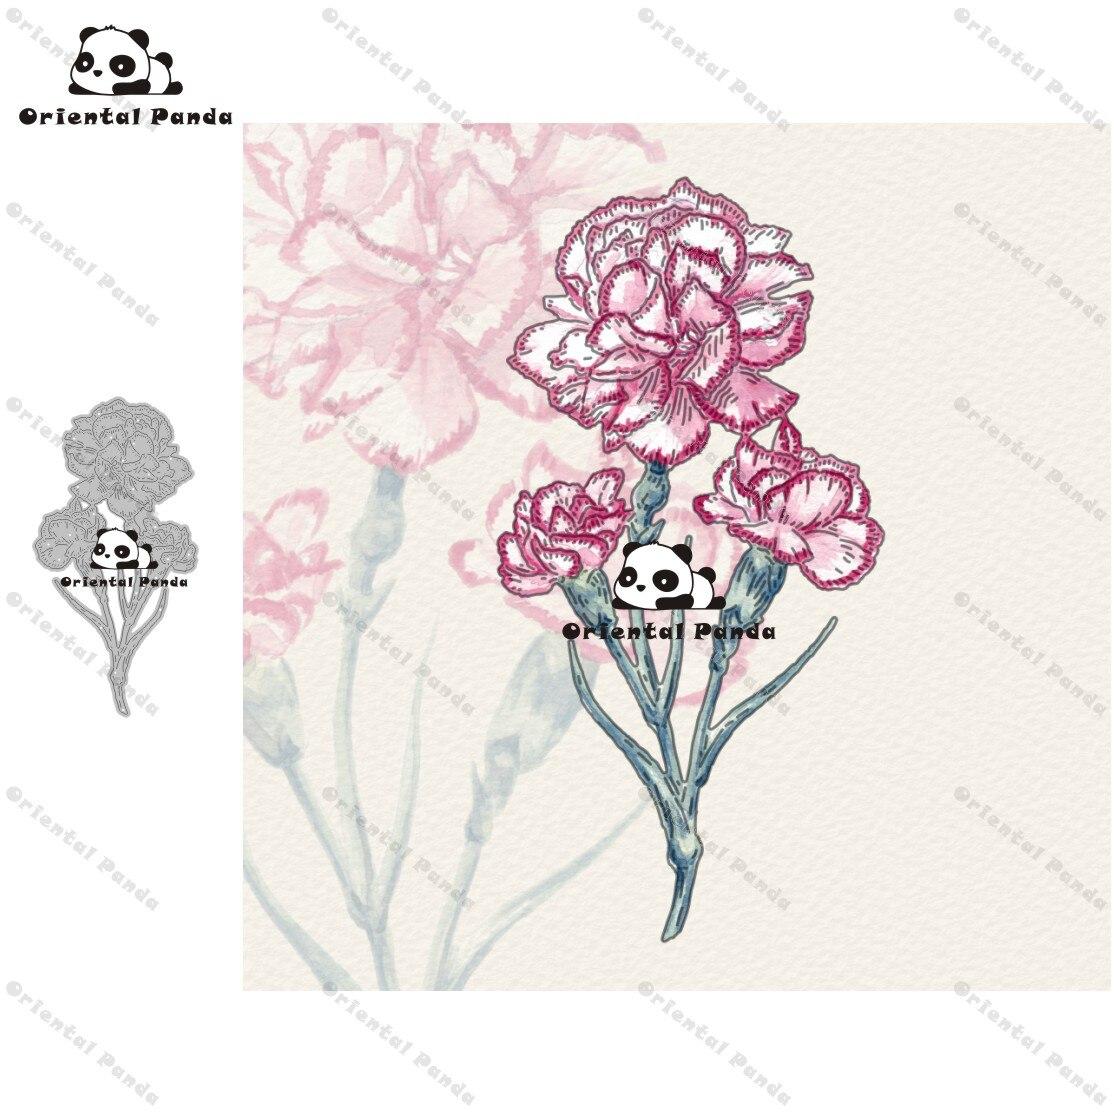 New Dies 2020 Carnation Metal Cutting Dies Diy Dies Photo Album  Cutting Dies Scrapbooking Stencil Die Cuts Card Making